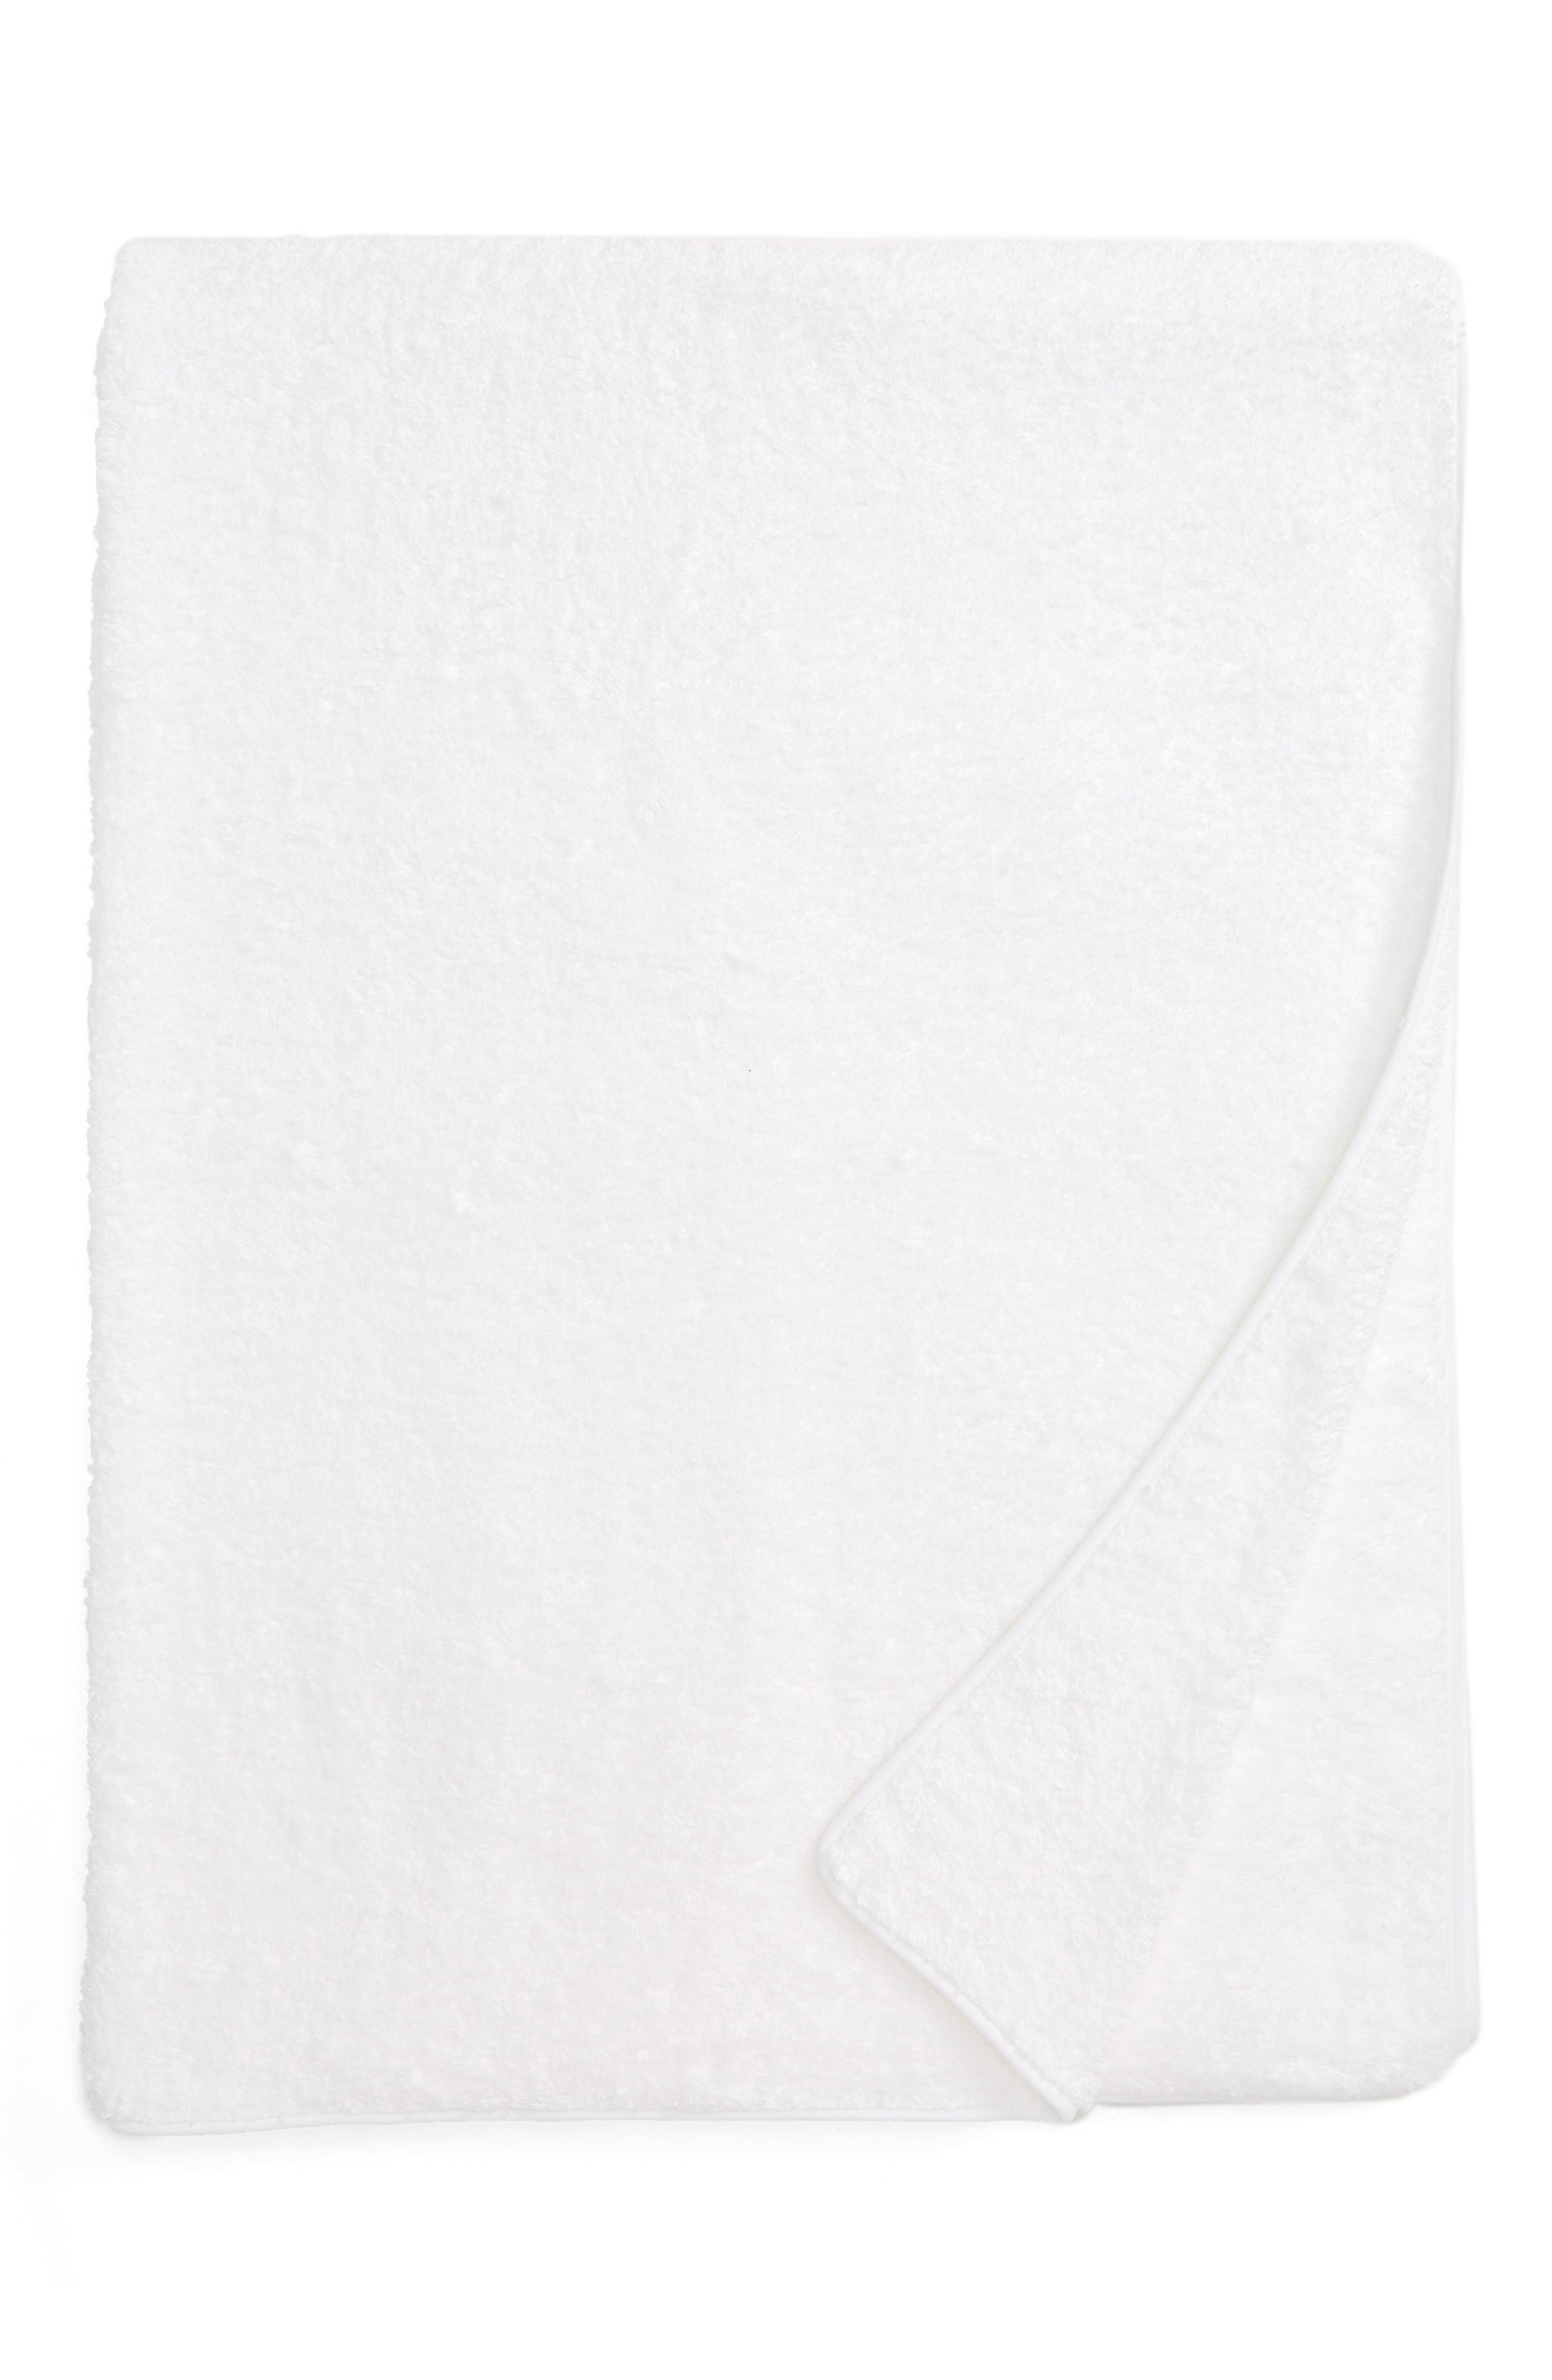 Cairo Bath Sheet,                             Main thumbnail 1, color,                             White